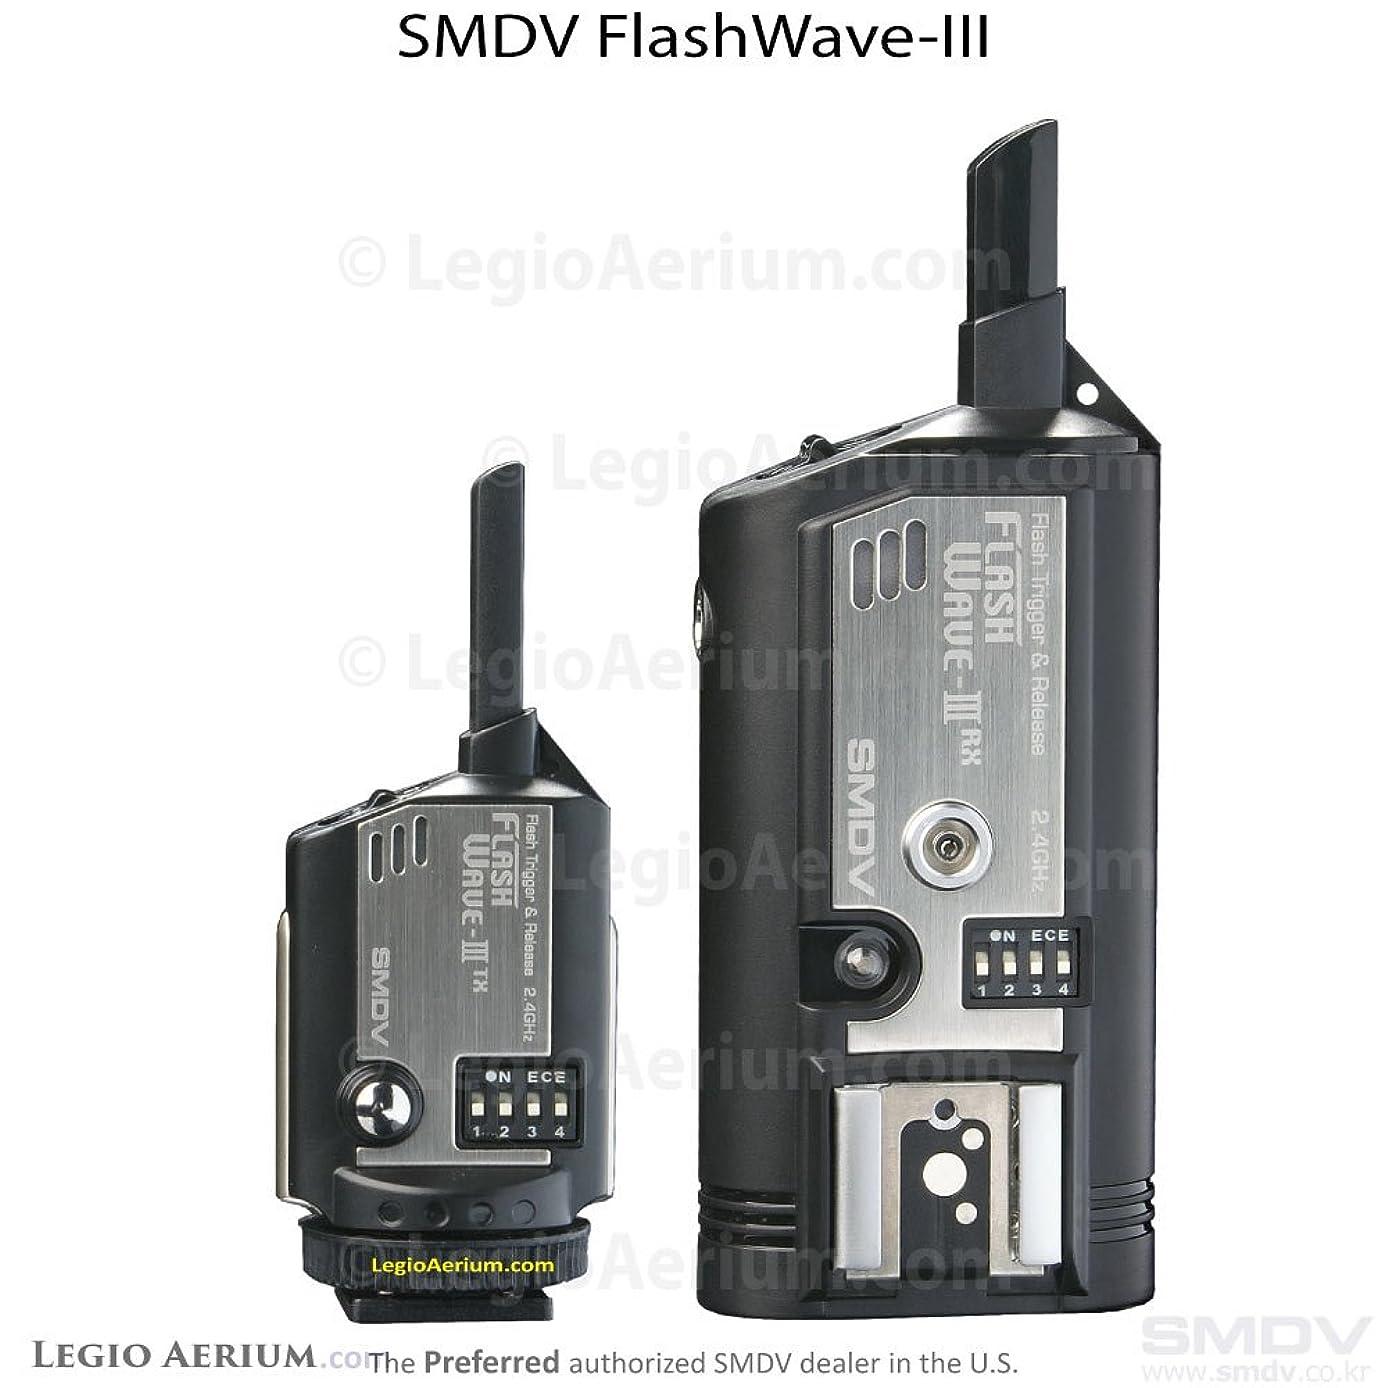 FlashWave3 Wireless Radio Slave Hot Shoe Remote Wireless Flash Trigger System - Transmitter and Receiver Set